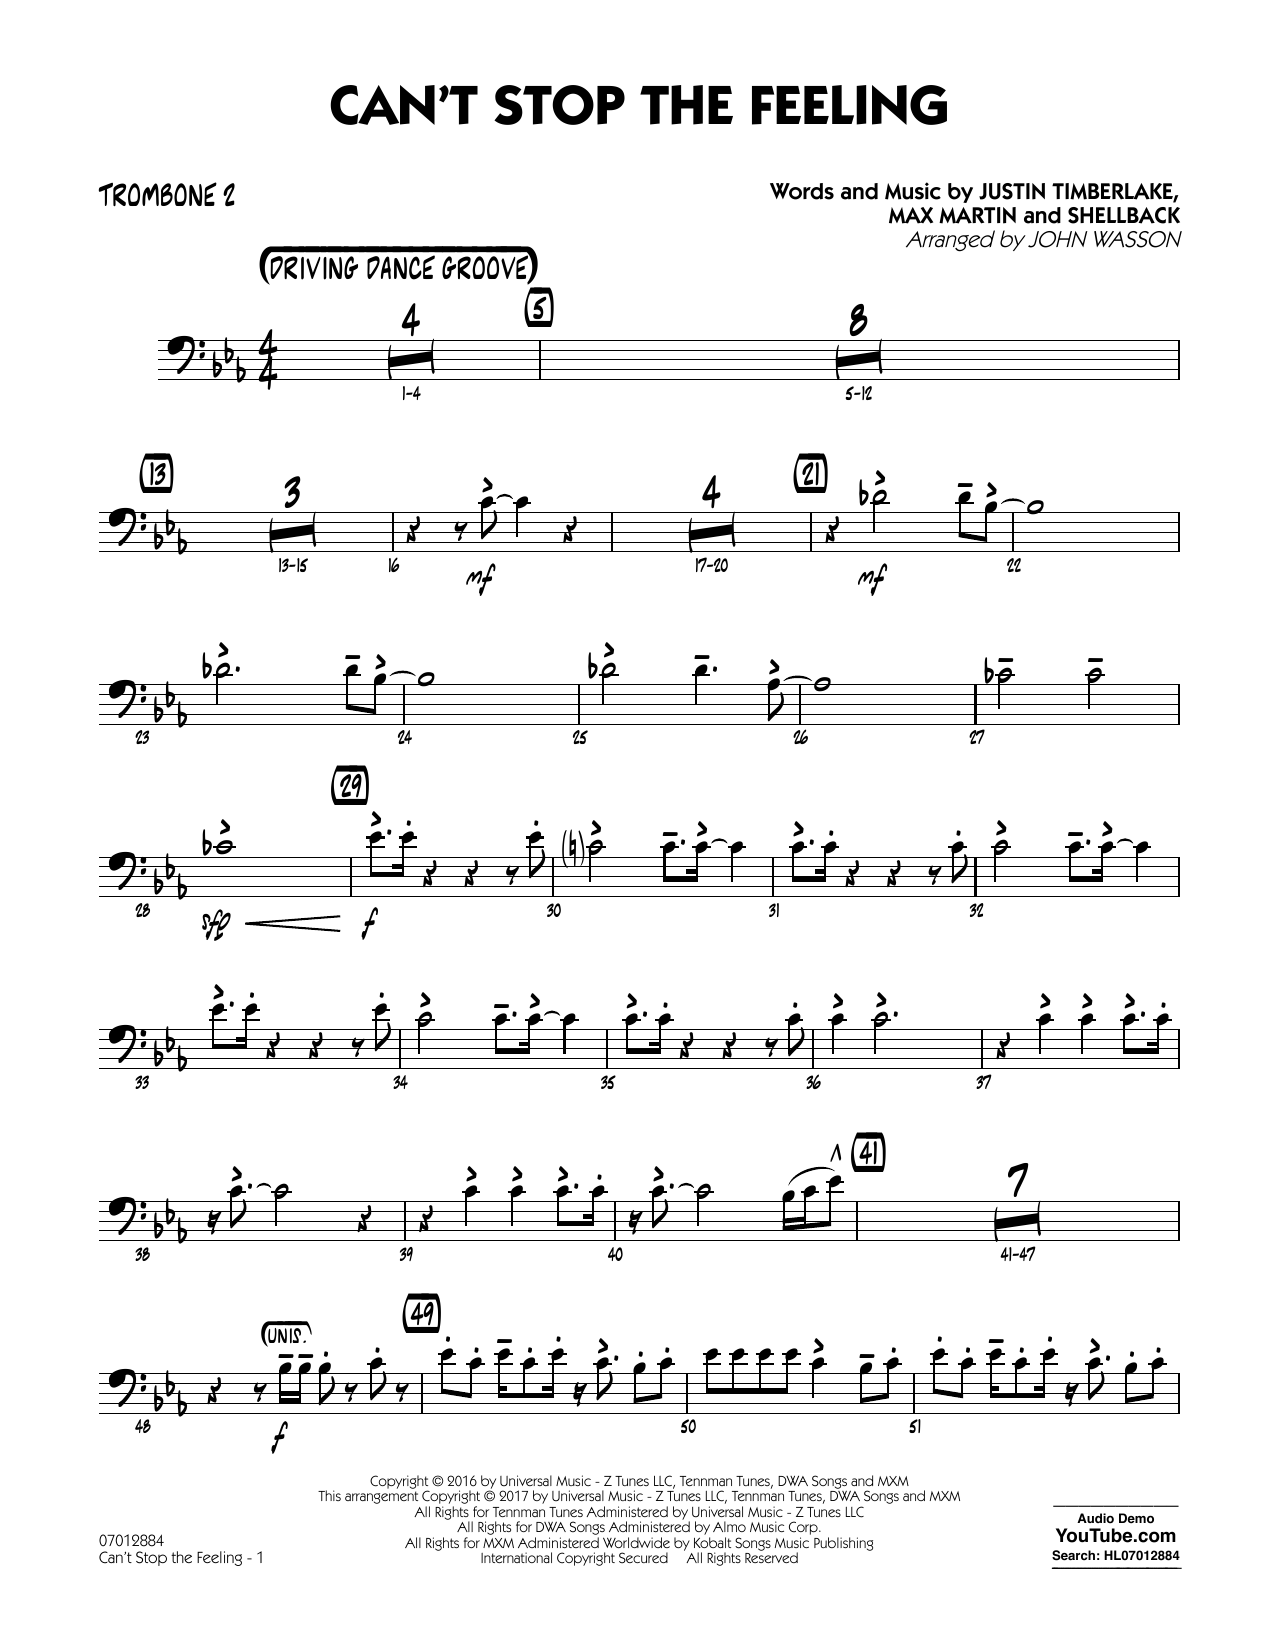 Can't Stop the Feeling - Trombone 2